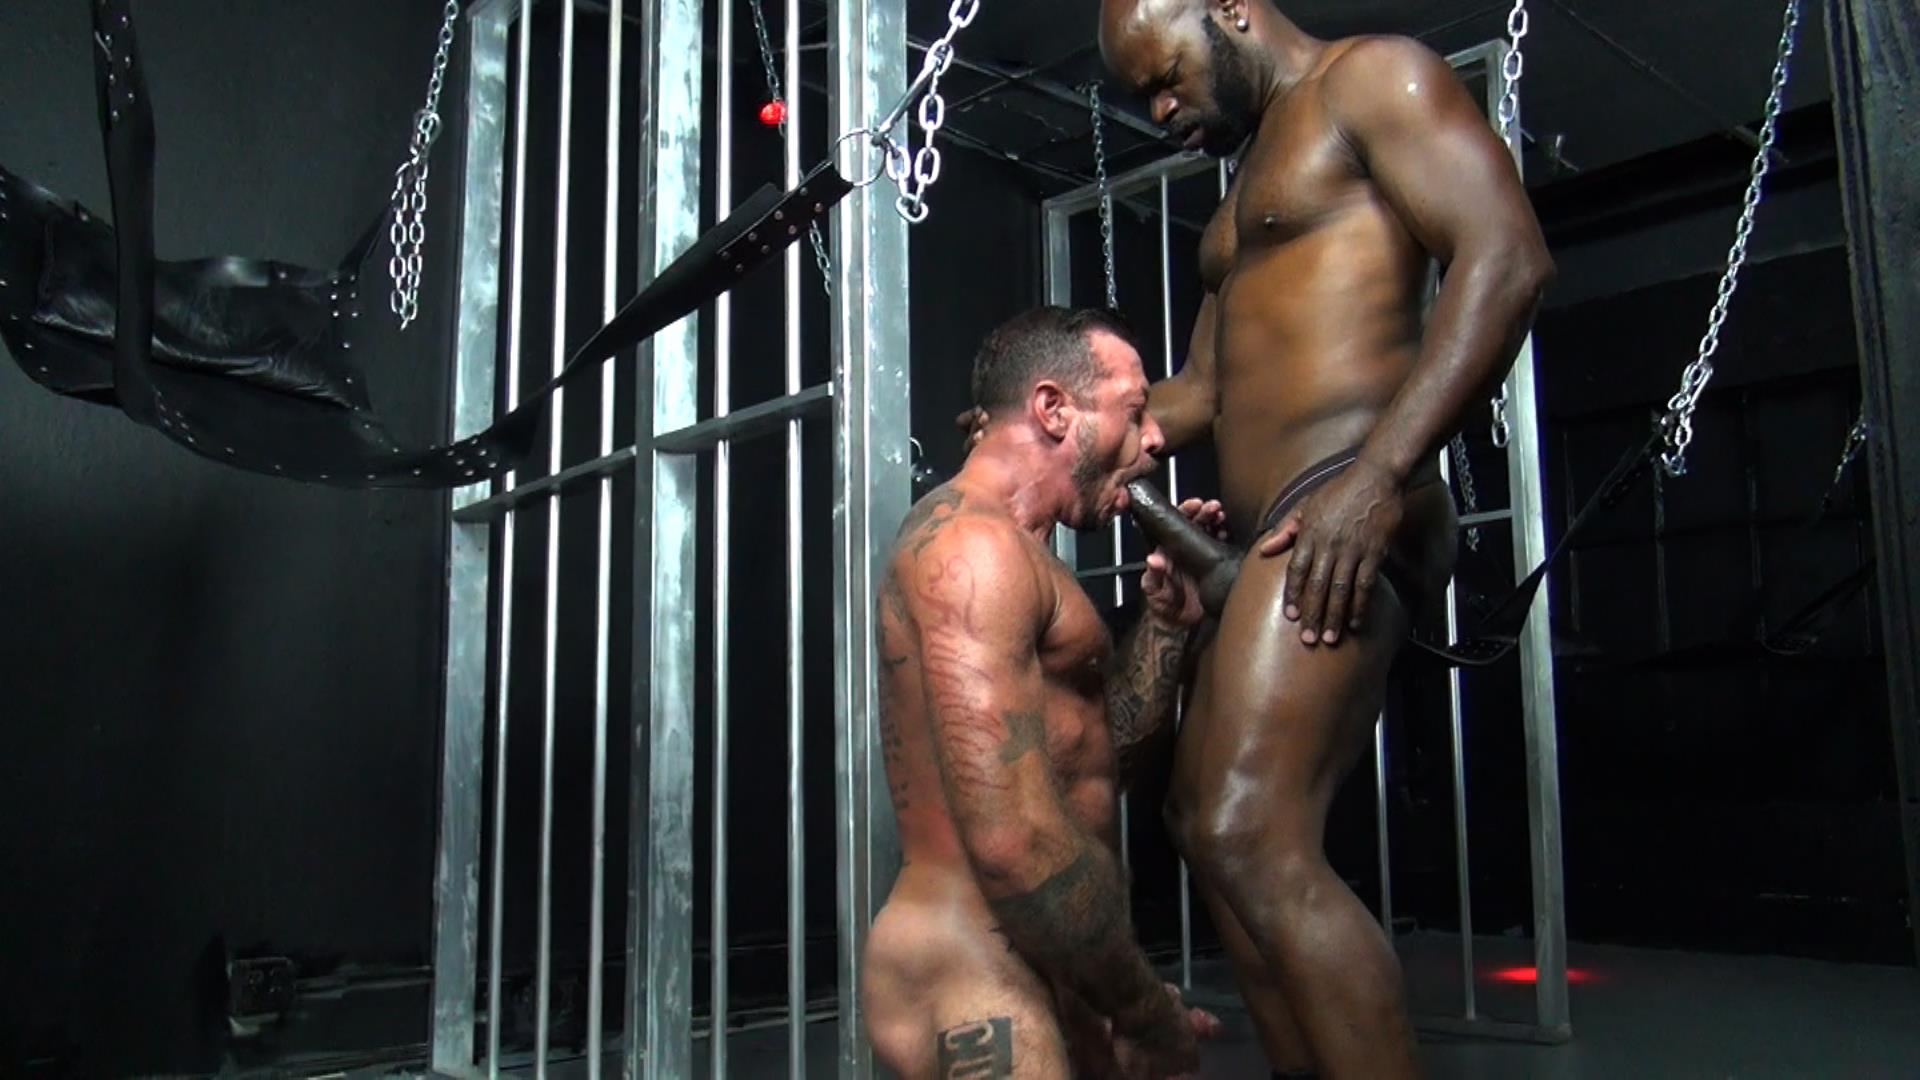 Raw-Fuck-Club-Cutler-X-and-Ray-Dalton-Interracial-Bareback-Sex-Amateur-Gay-Porn-4 Cutler X Barebacking Hairy Muscle Daddy Ray Dalton With His Big Black Cock